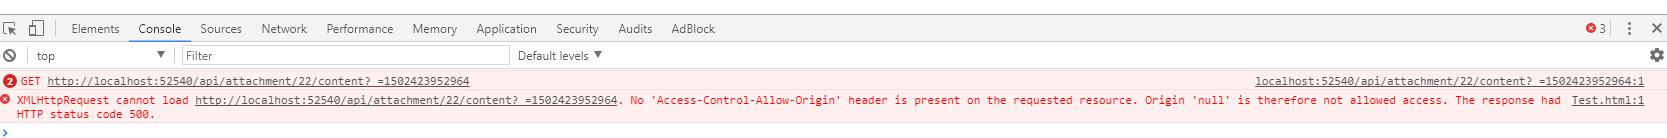 Asp net core web api that returns File is throwing No